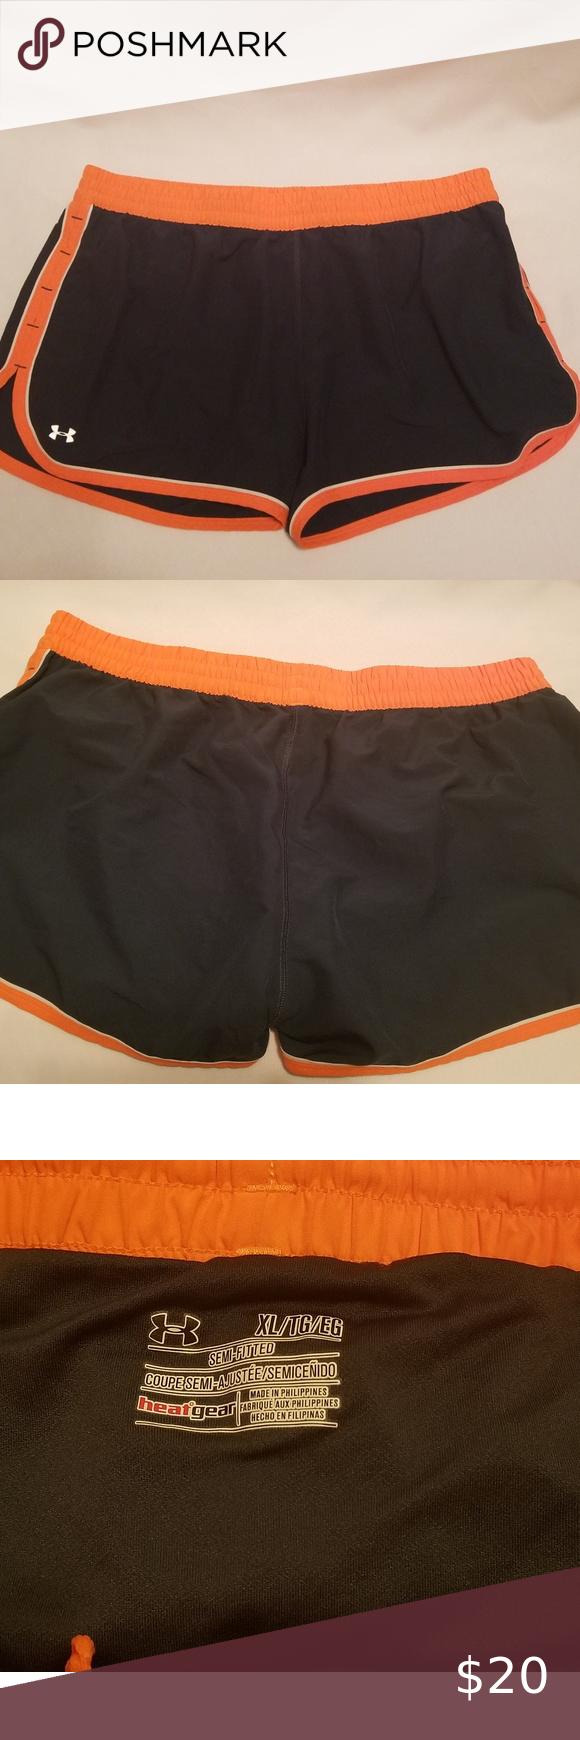 Under Armour Semi Fitted Heatgear Running Shorts Clothes Design Fashion Fashion Design